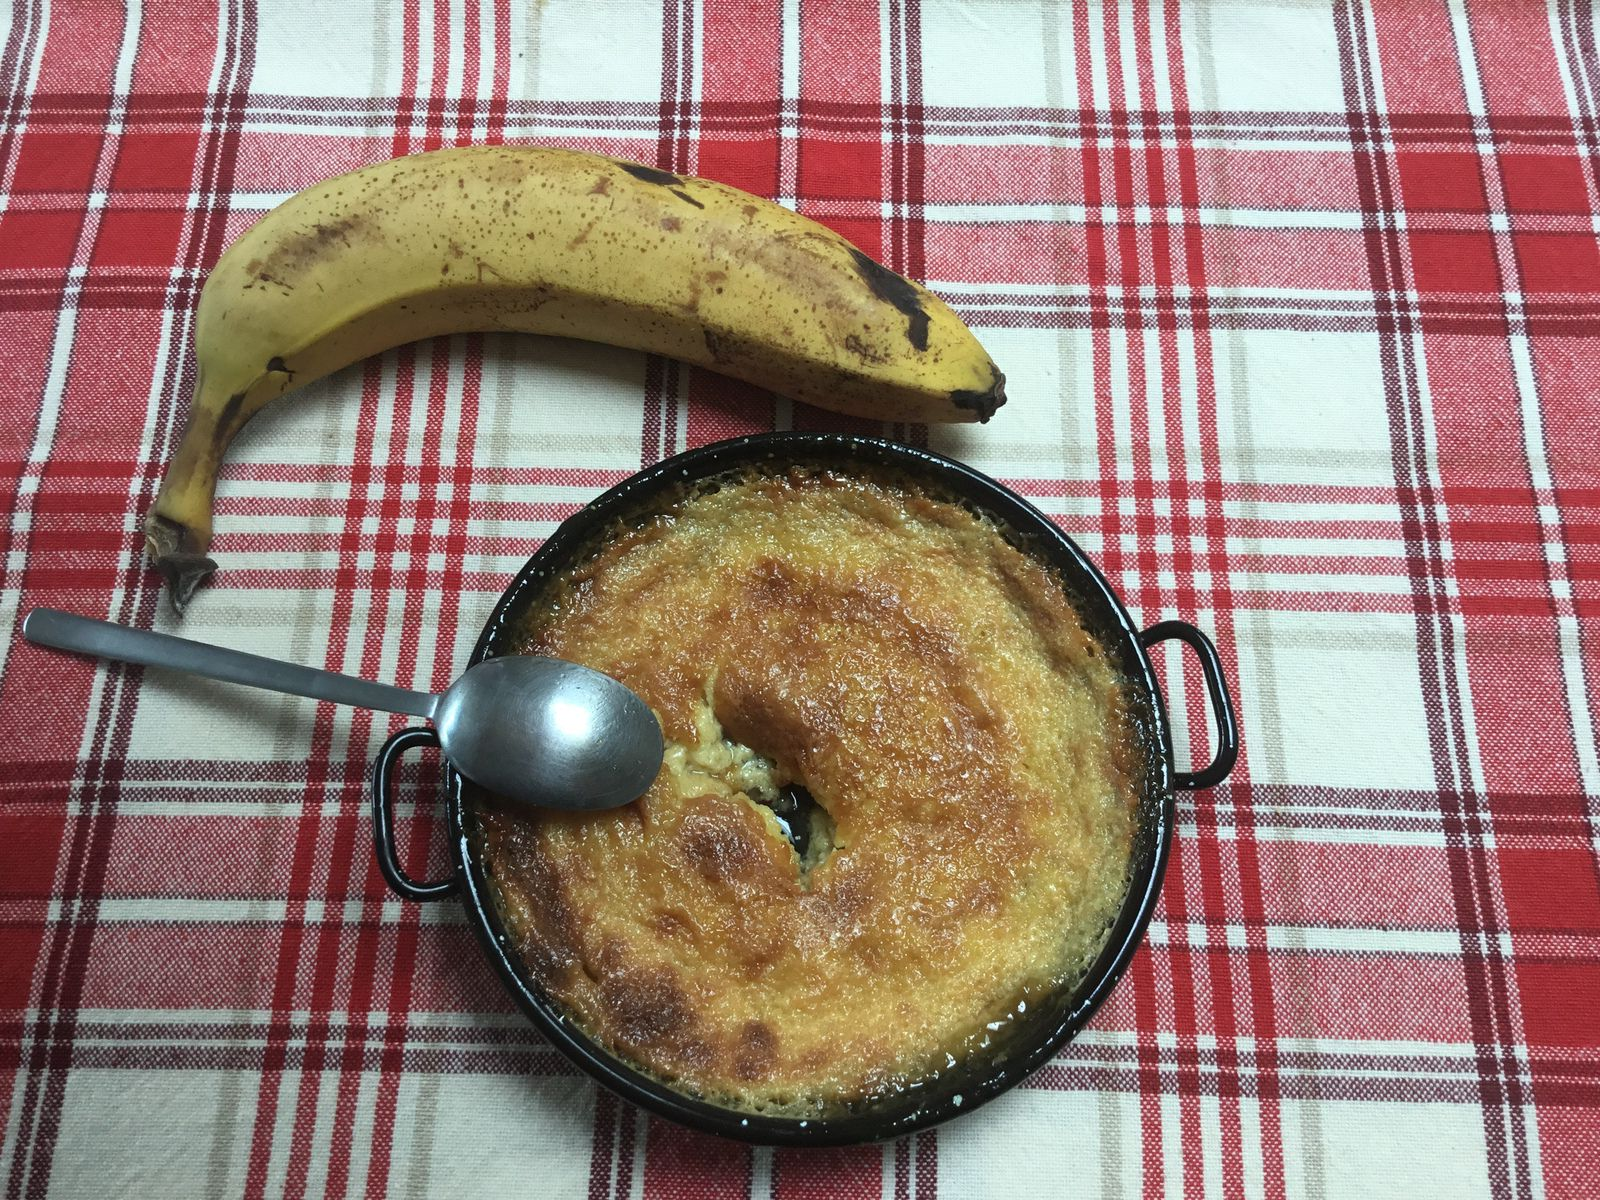 Gratin de banane au rhum